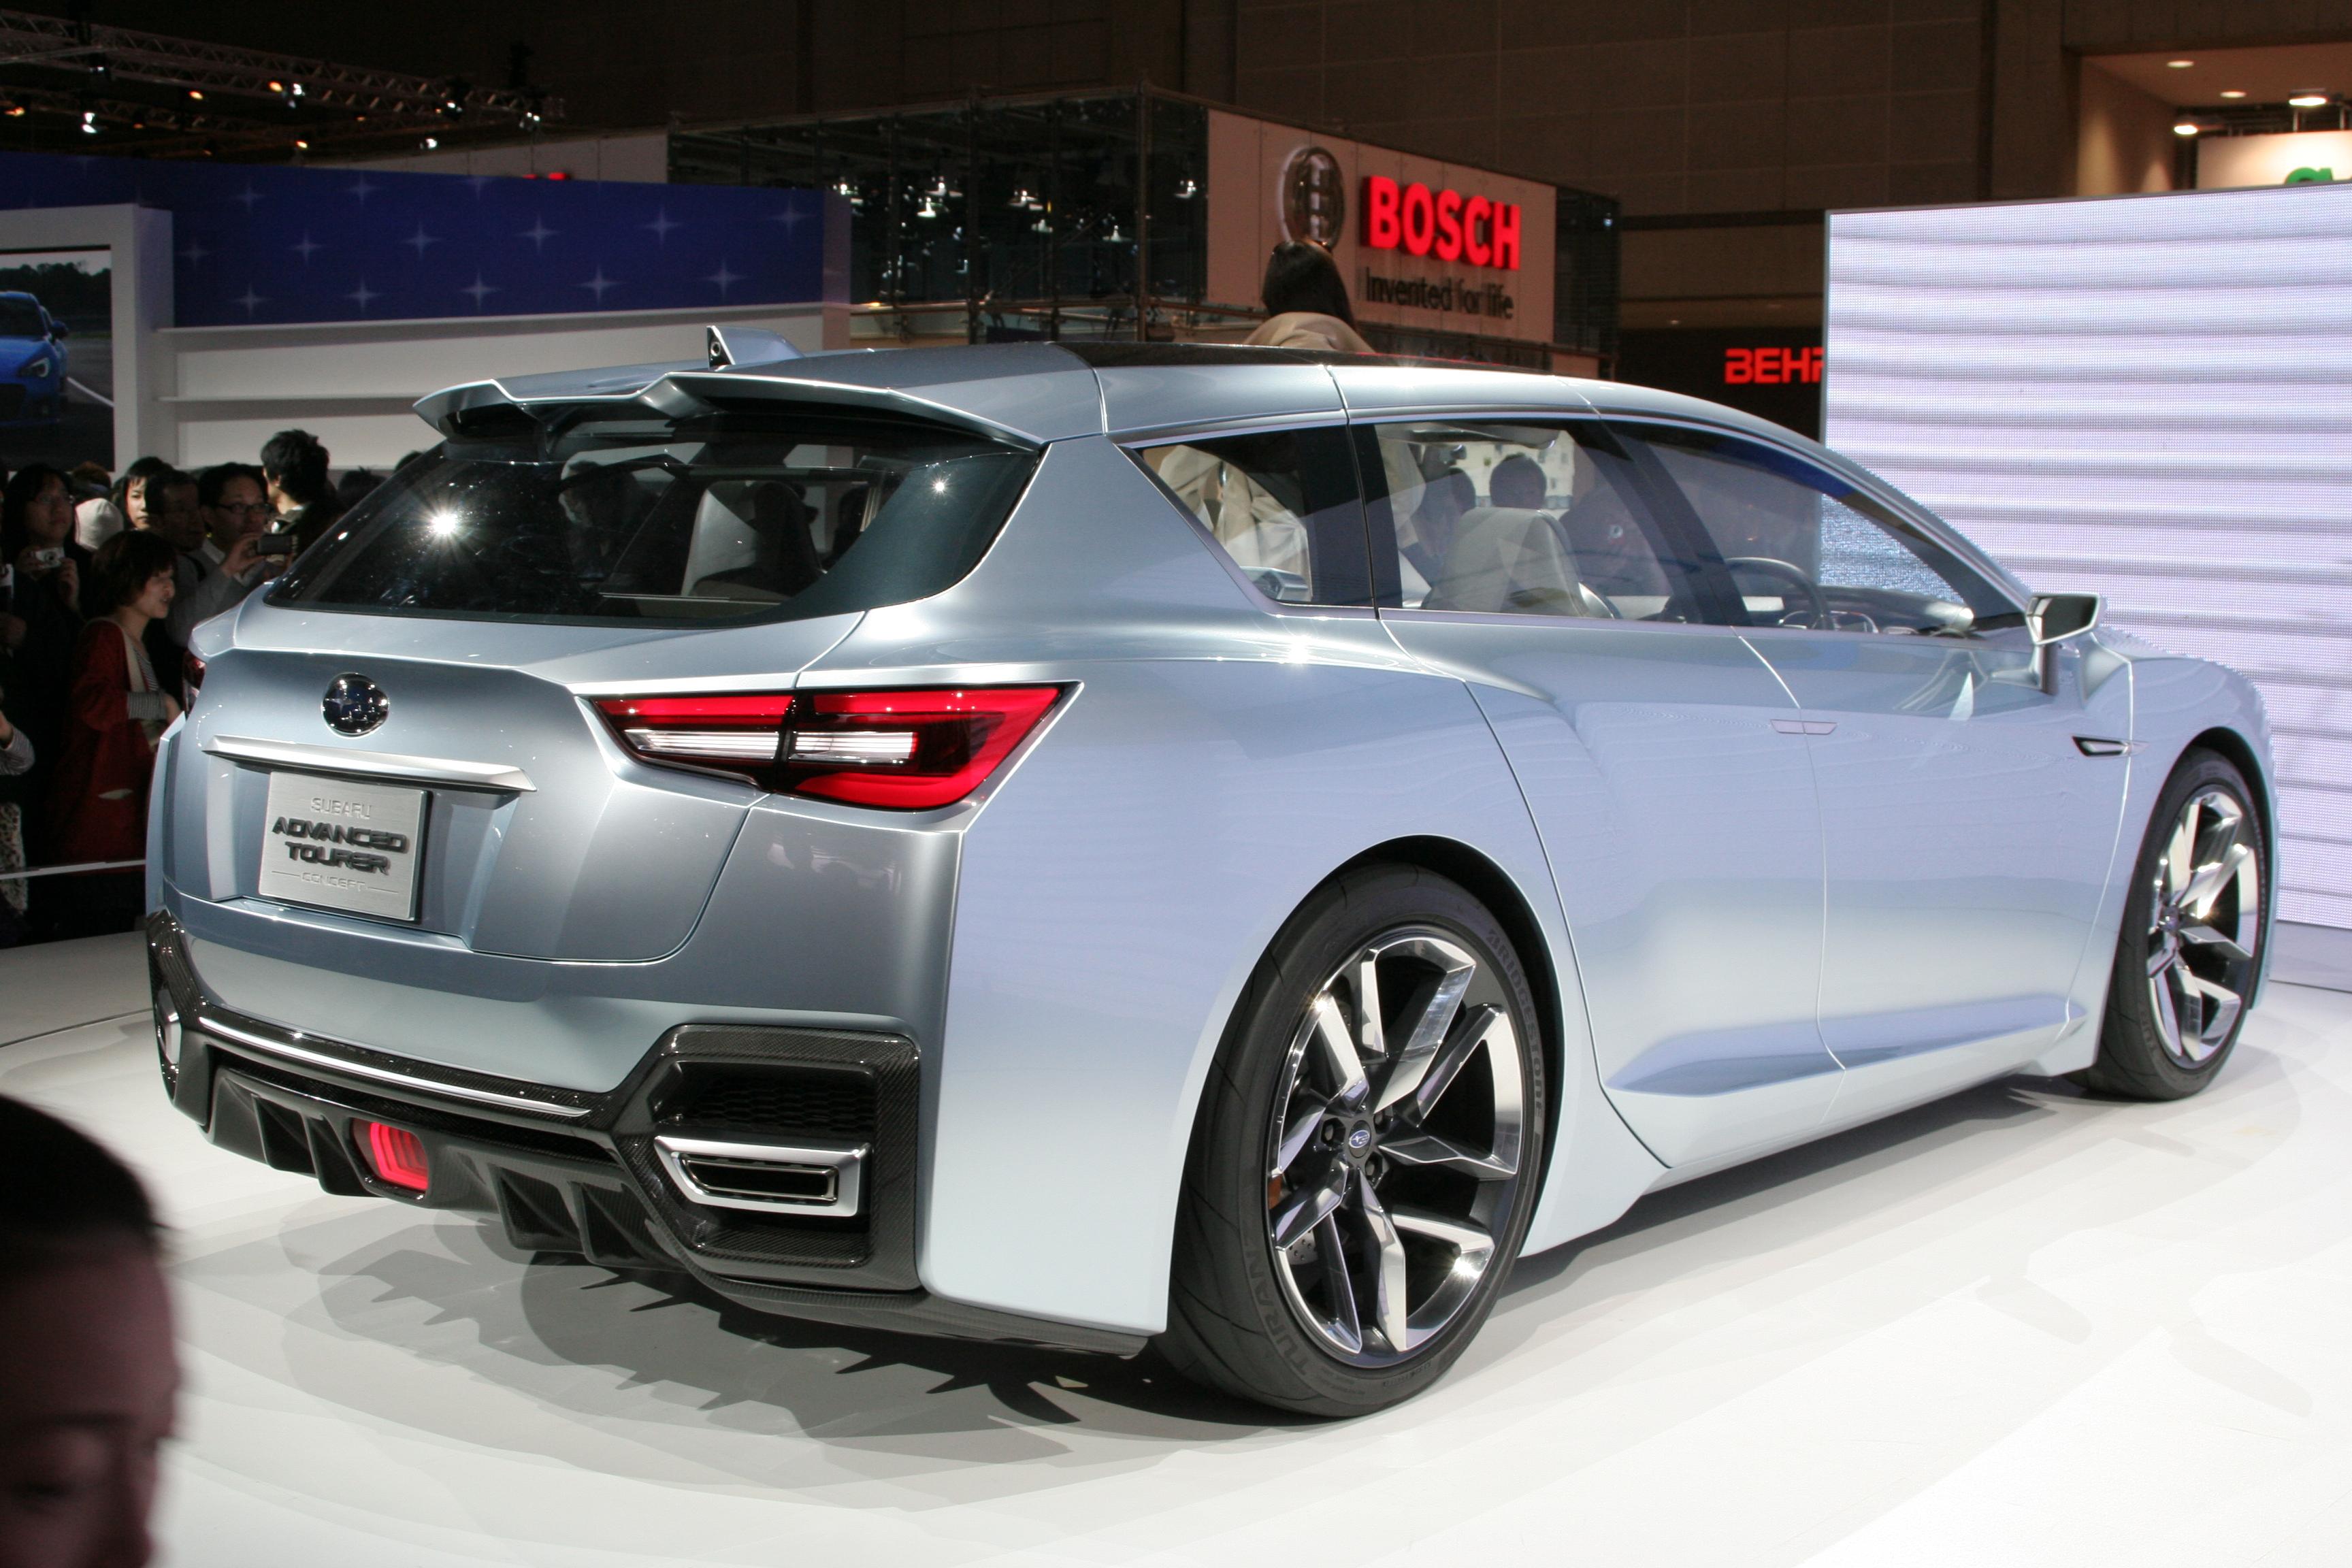 2019 Subaru Outback Redesign >> File:Subaru Advanced Tourer Concept rear.jpg - Wikimedia Commons